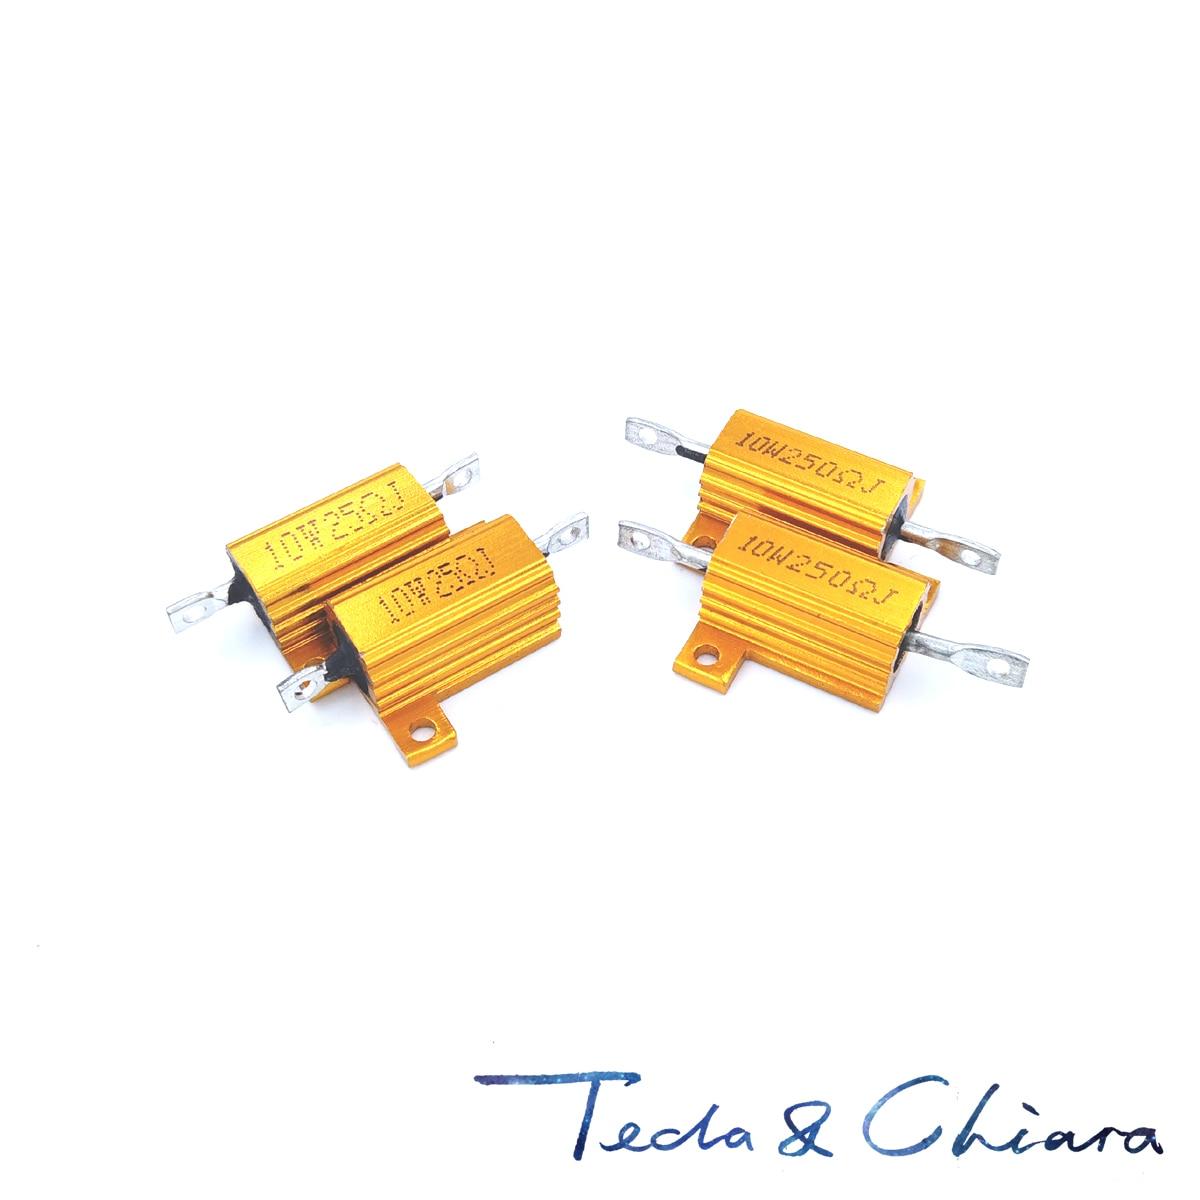 100R 100 100ohm 10R 10 10ohm R Ohm 10W vatios tono dorado bobinado aluminio potencia carcasa de Metal resistencia RX24